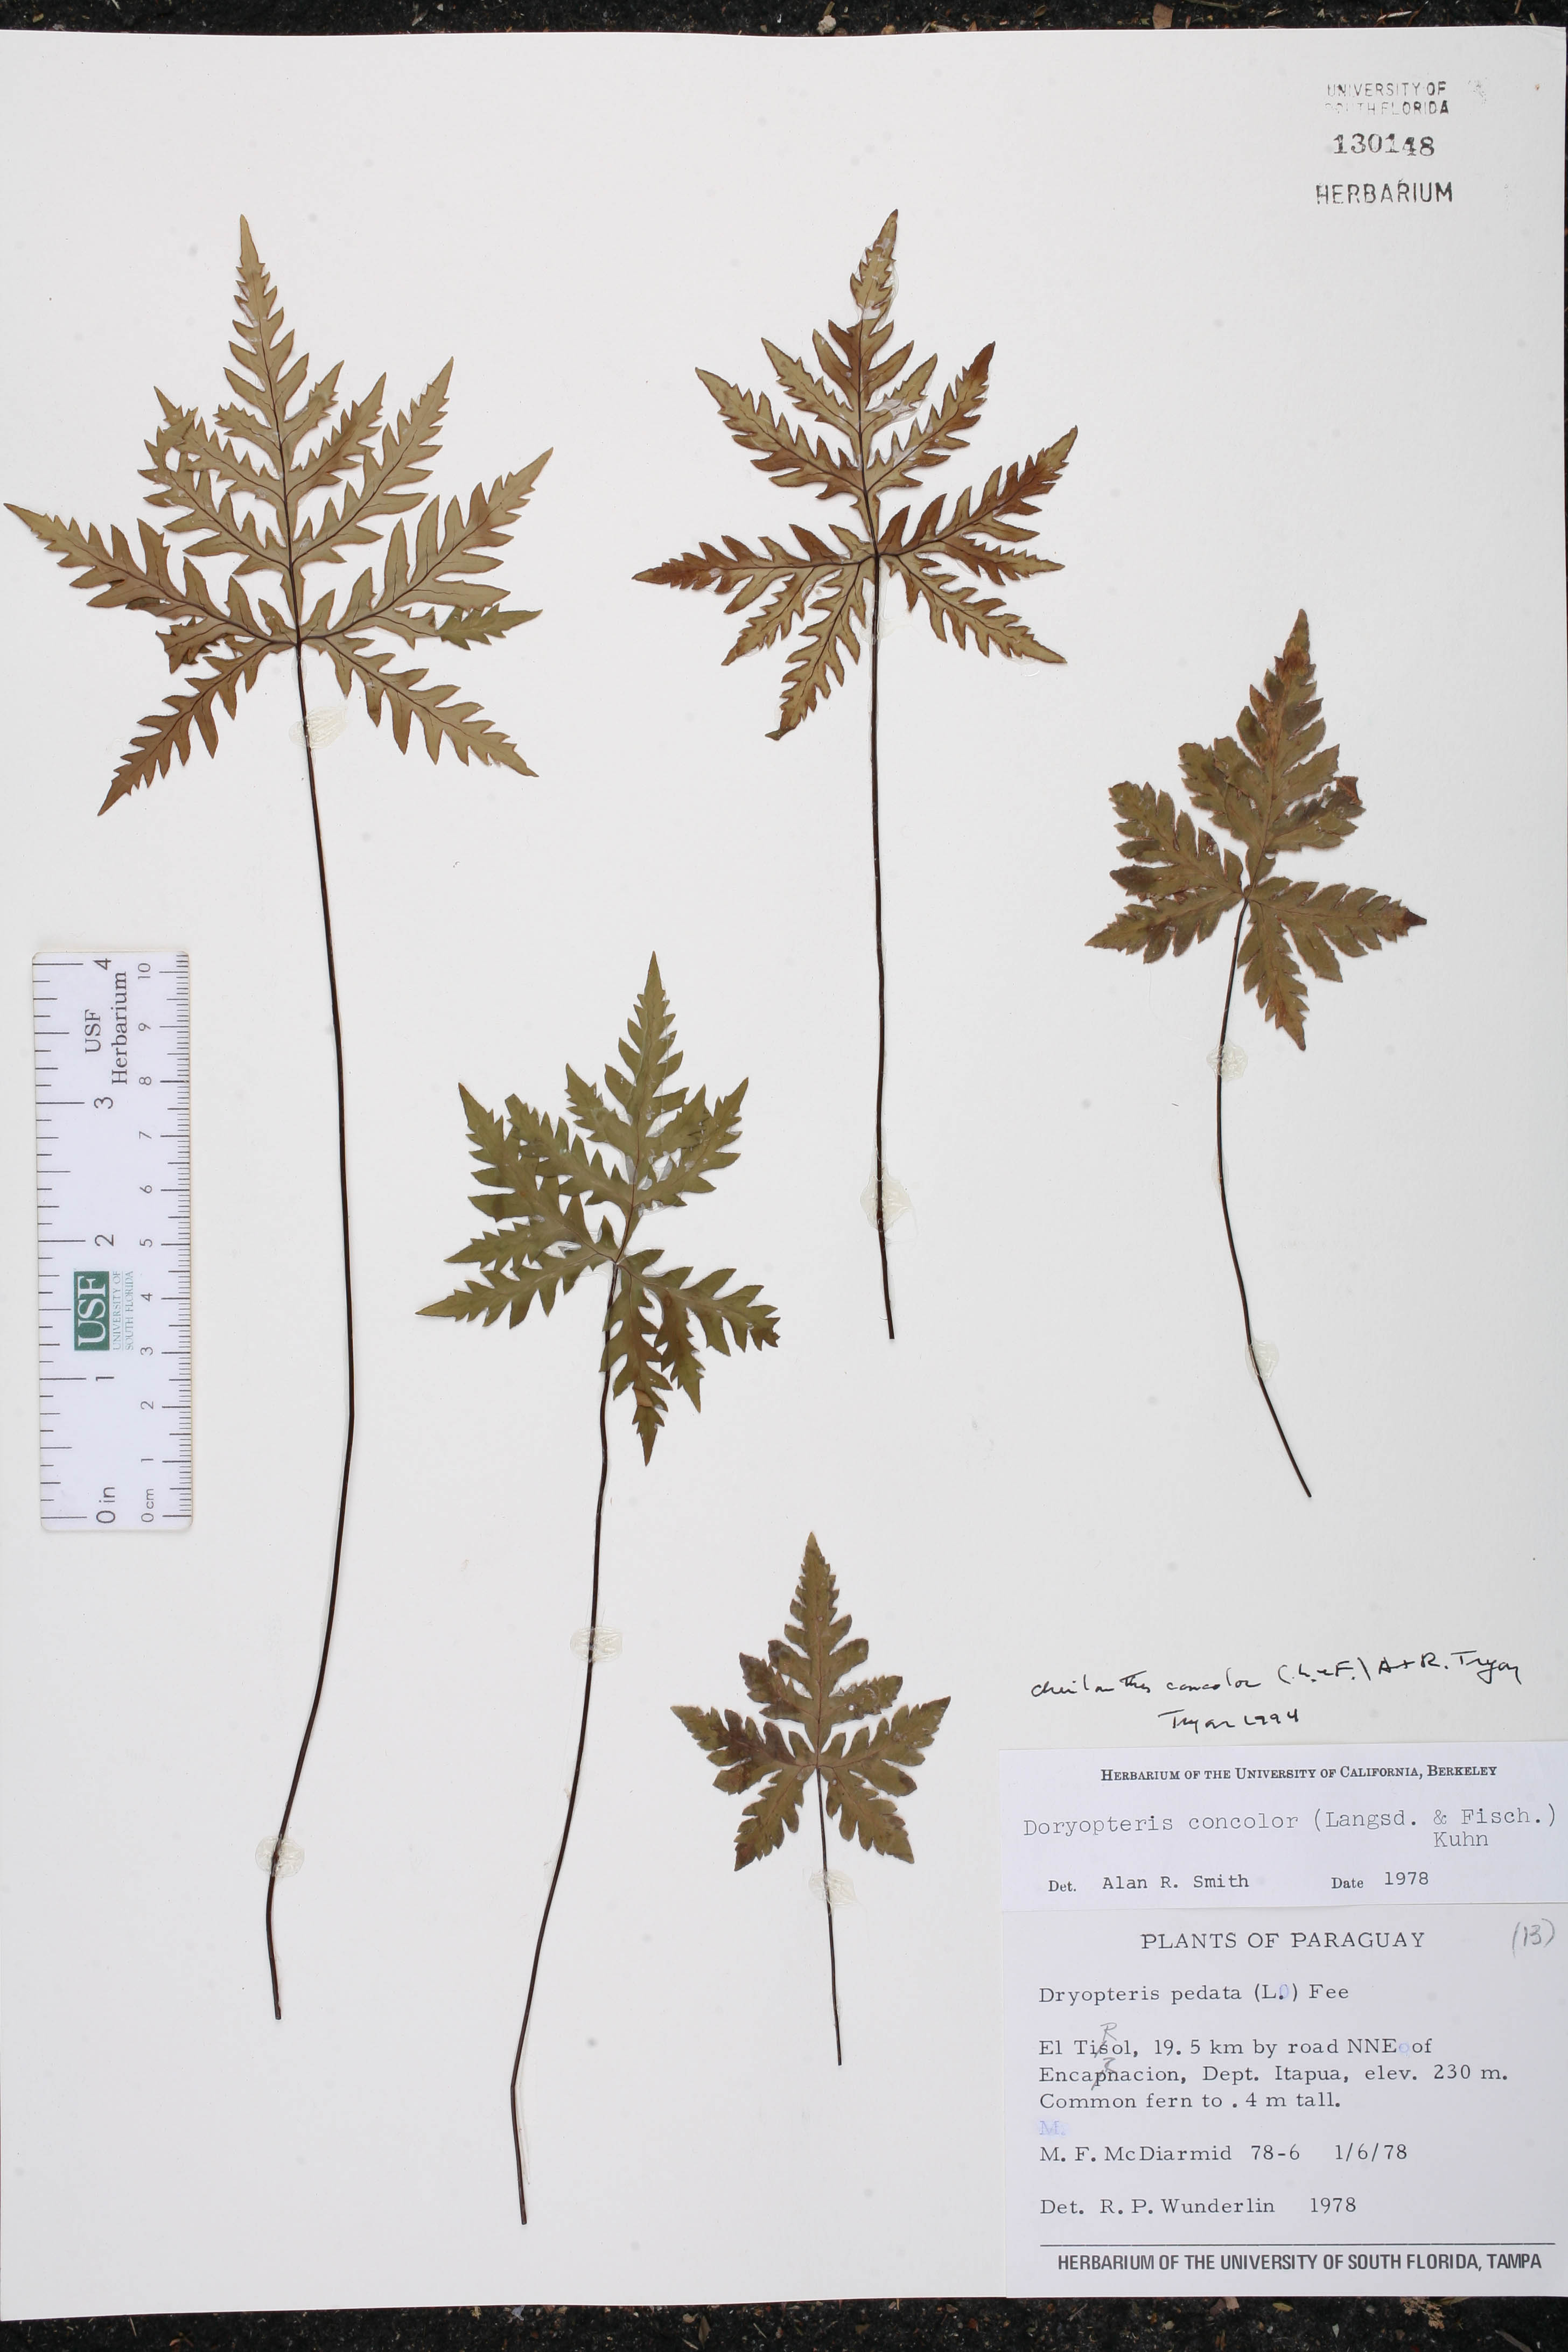 Cheilanthes concolor image